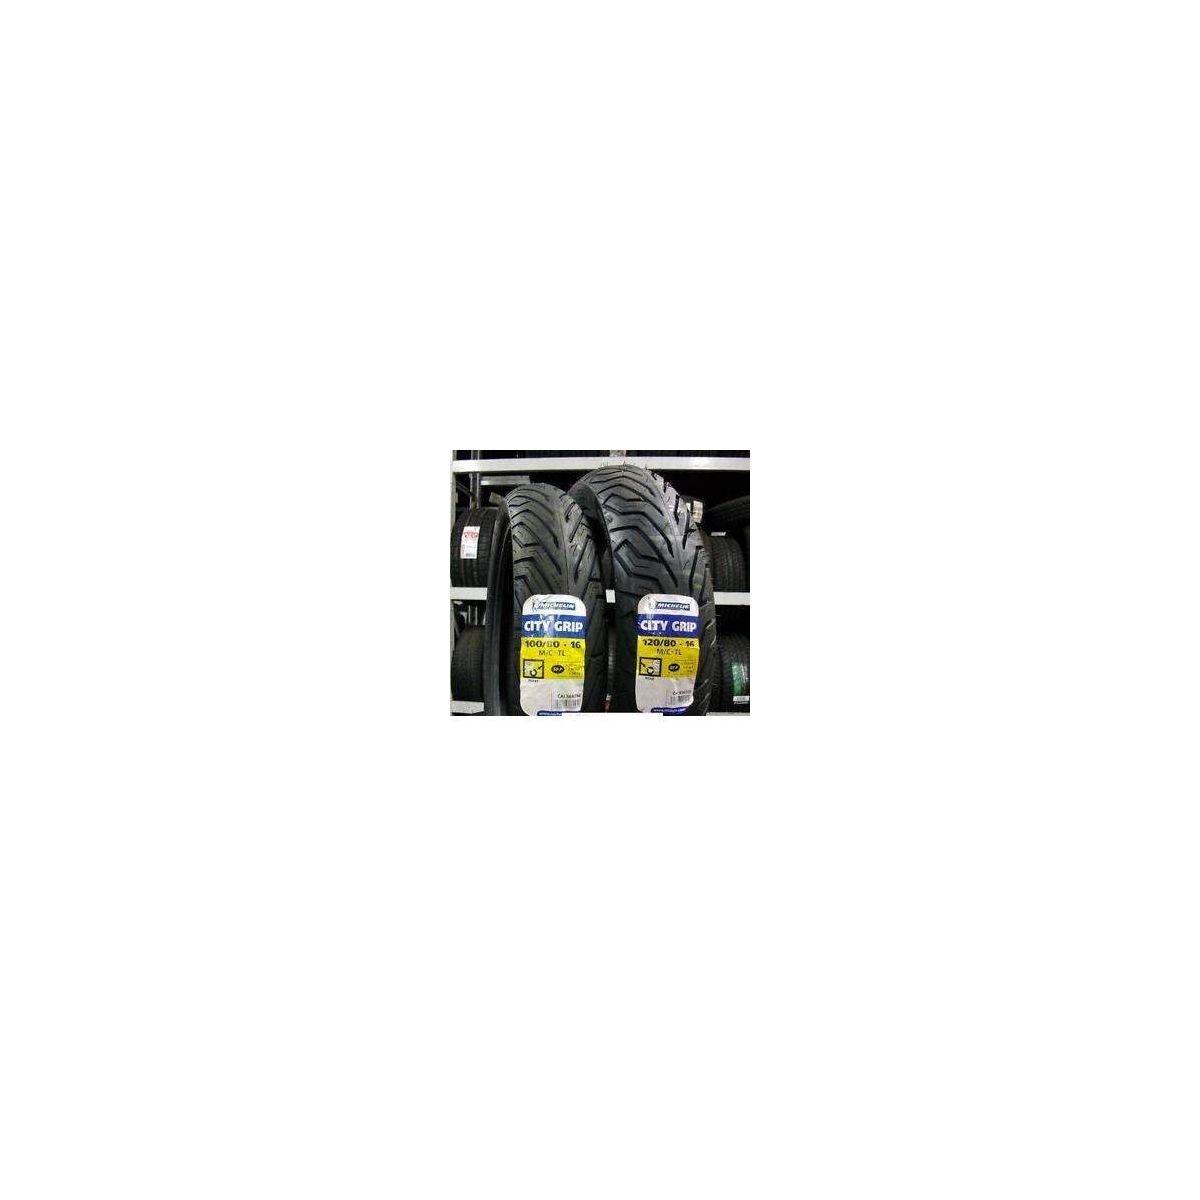 Coppia pneumatici Michelin City Grip per SH 125/150